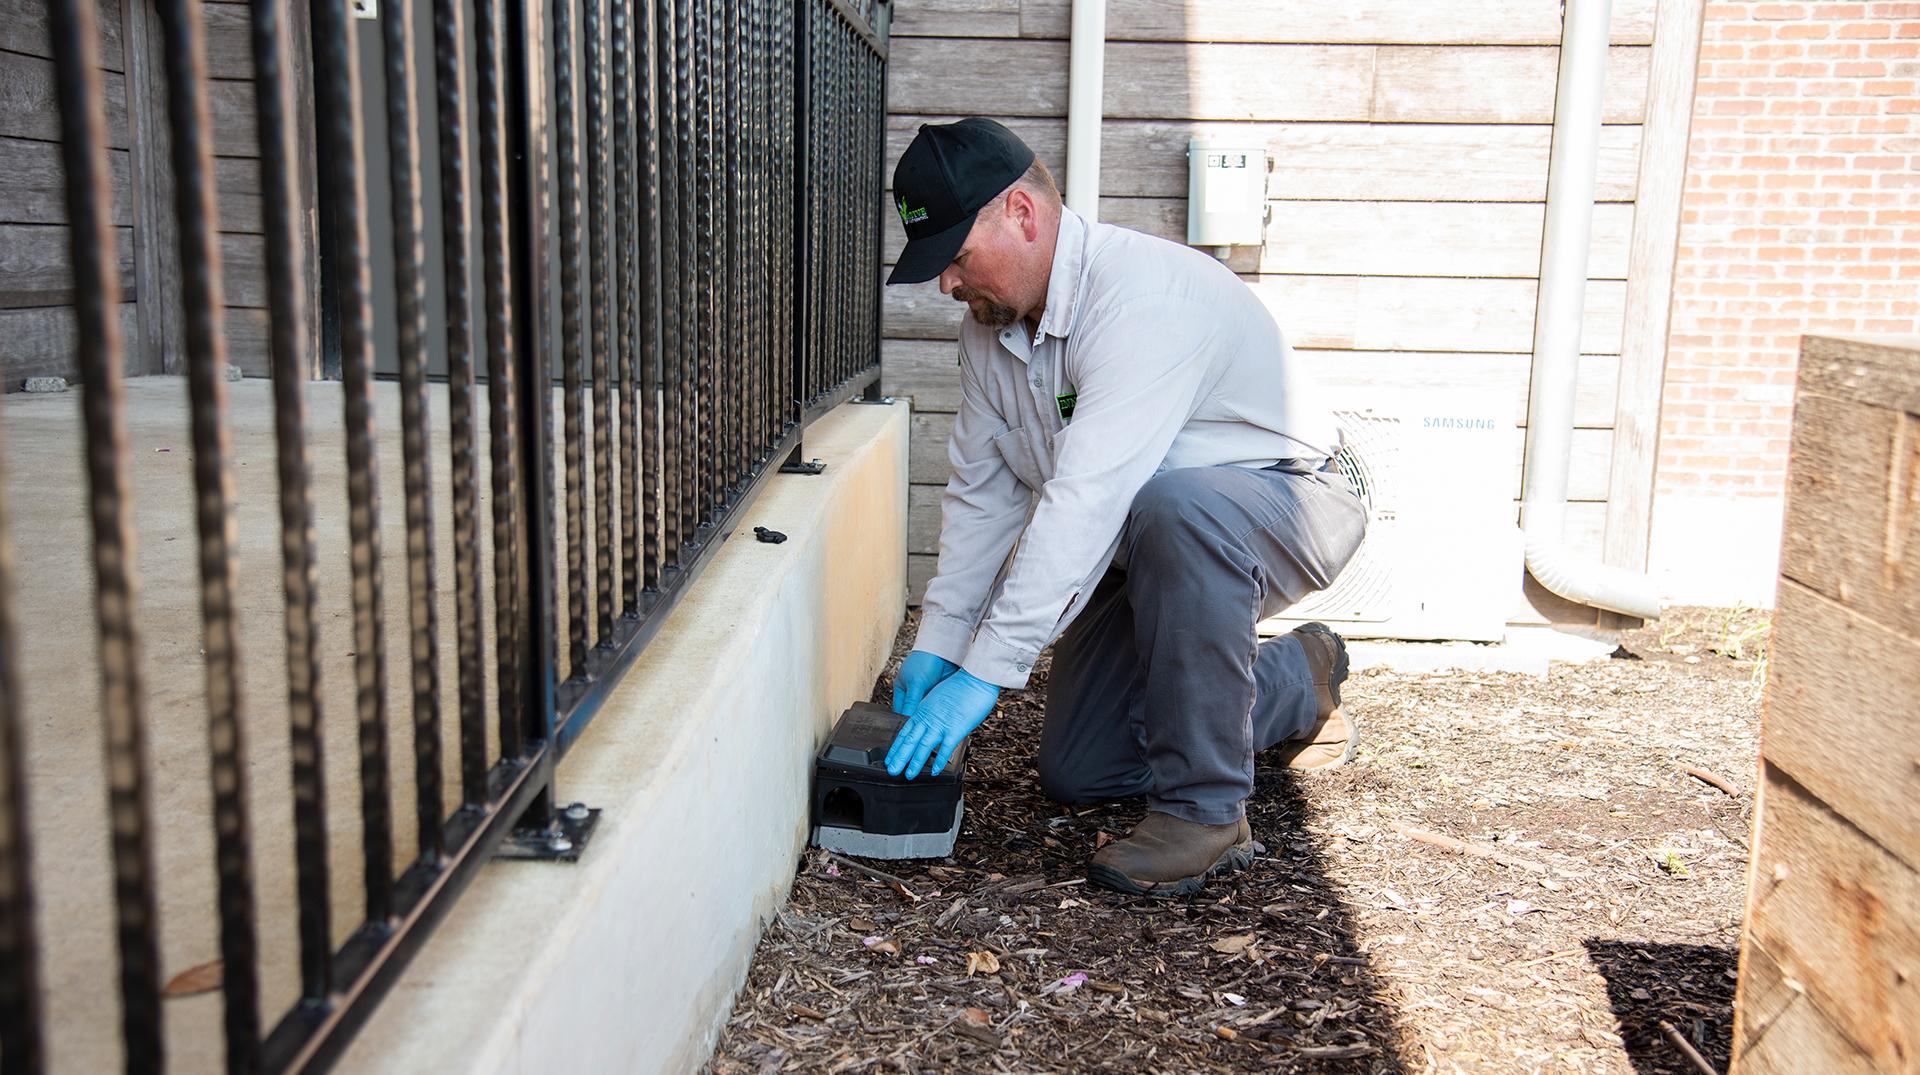 pest control technician servicing rodent bait box